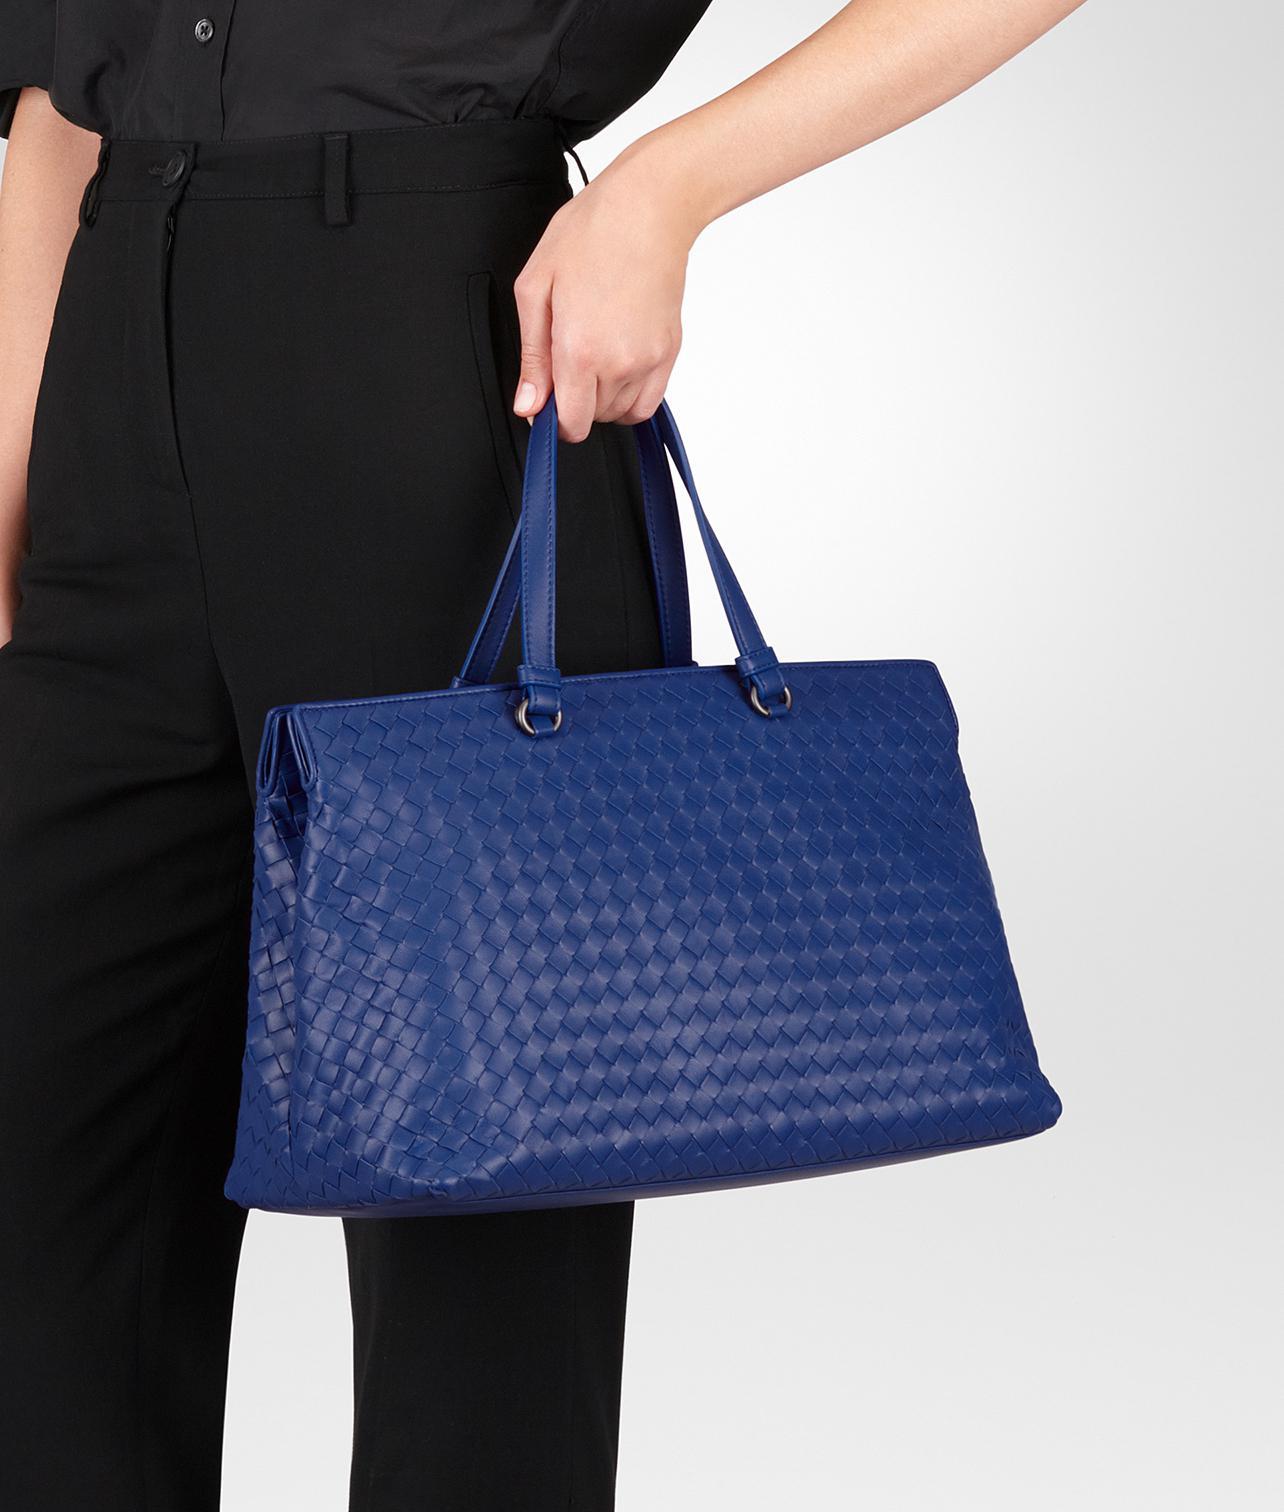 b05fcf0e7c6 Lyst - Bottega Veneta Cobalt Intrecciato Nappa Large Top Handle Bag ...